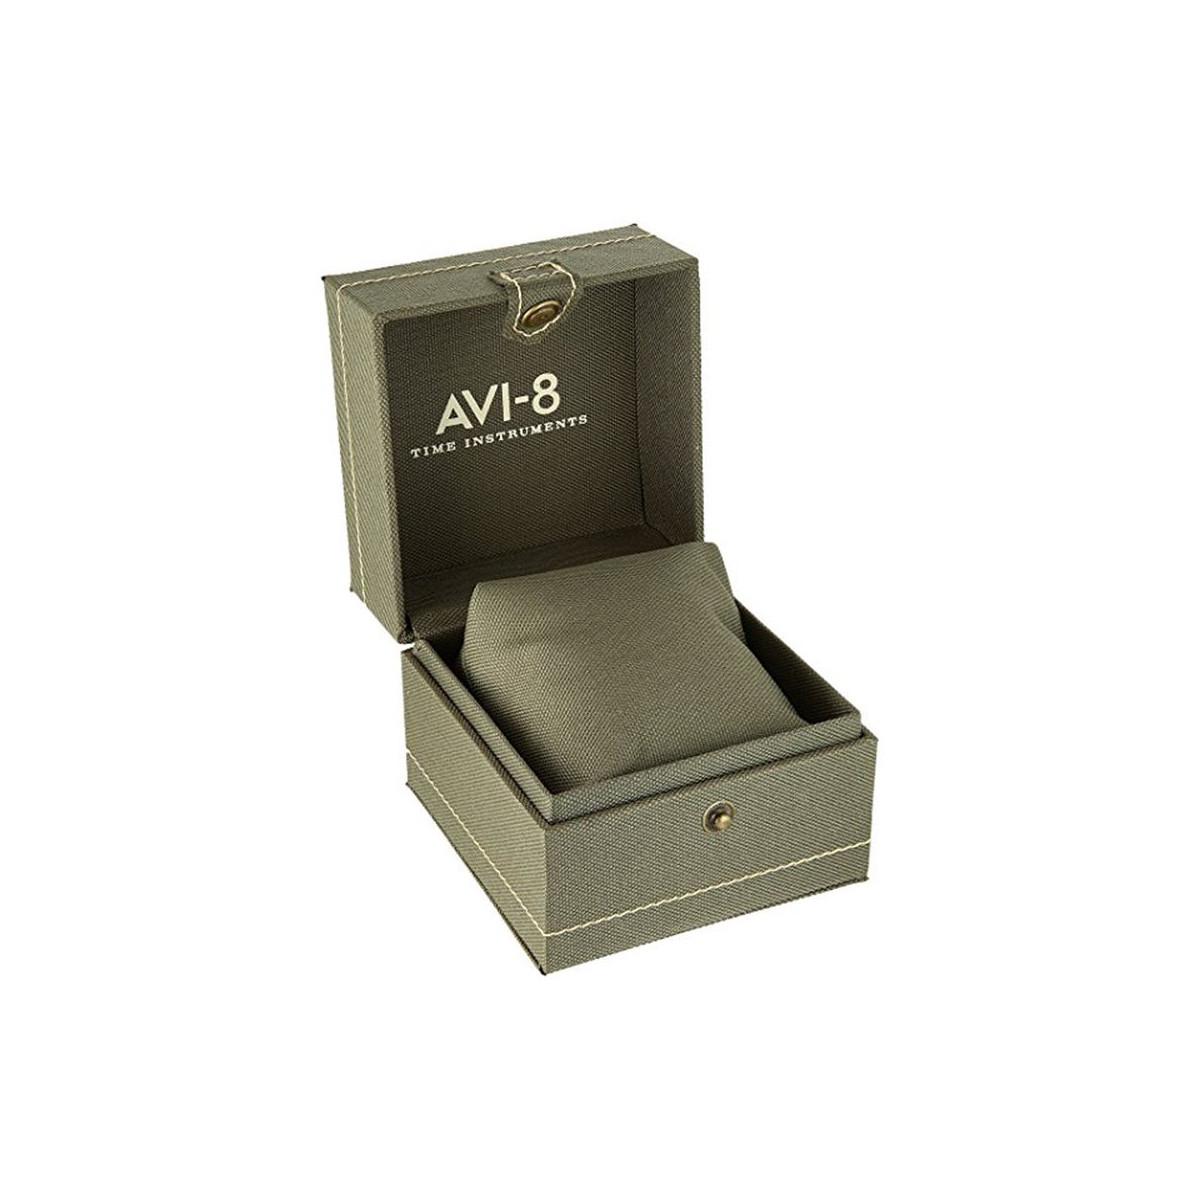 Montre AVI-8 FLYBOY LAFAYETTE méca-quartz cadran noir